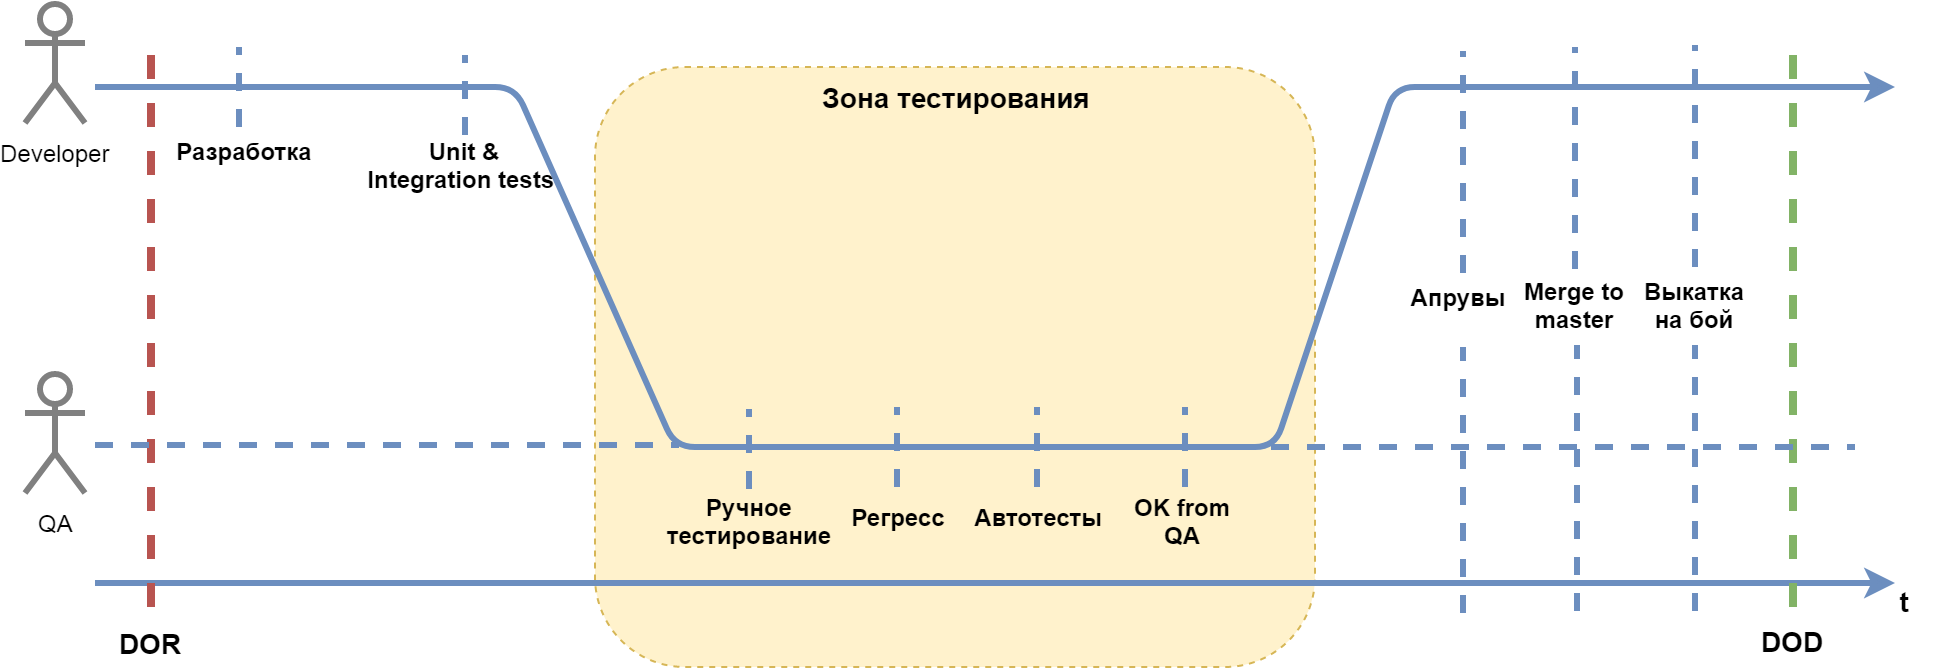 Синхронизация команды со SCRUM - 4